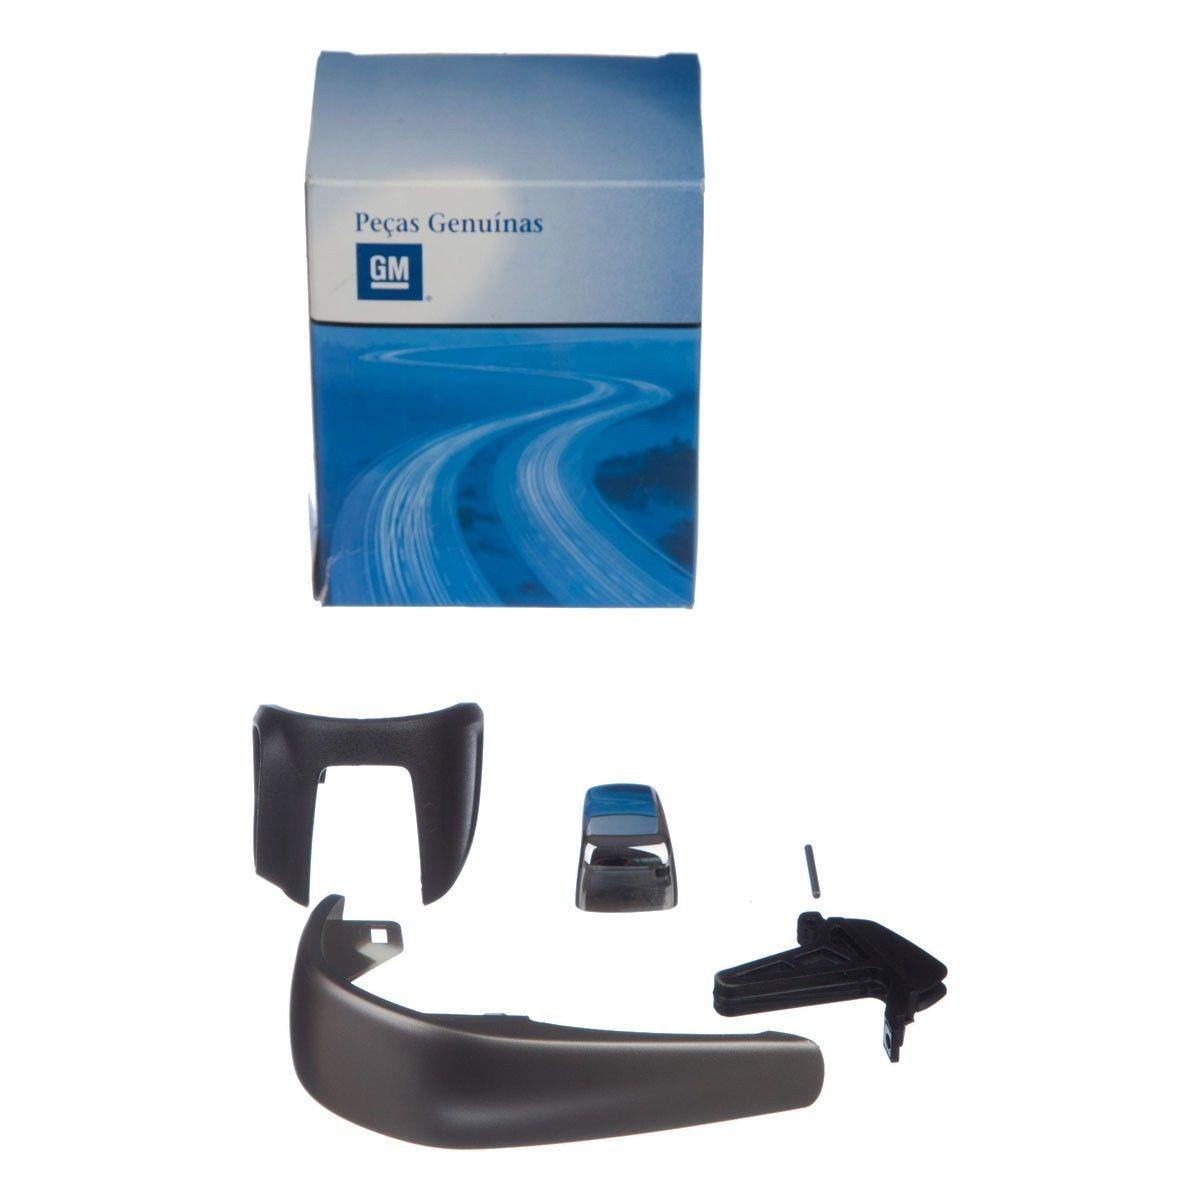 Kit reparo botoes alavanca cambio automatico - Onix Ate 2014 a 2016